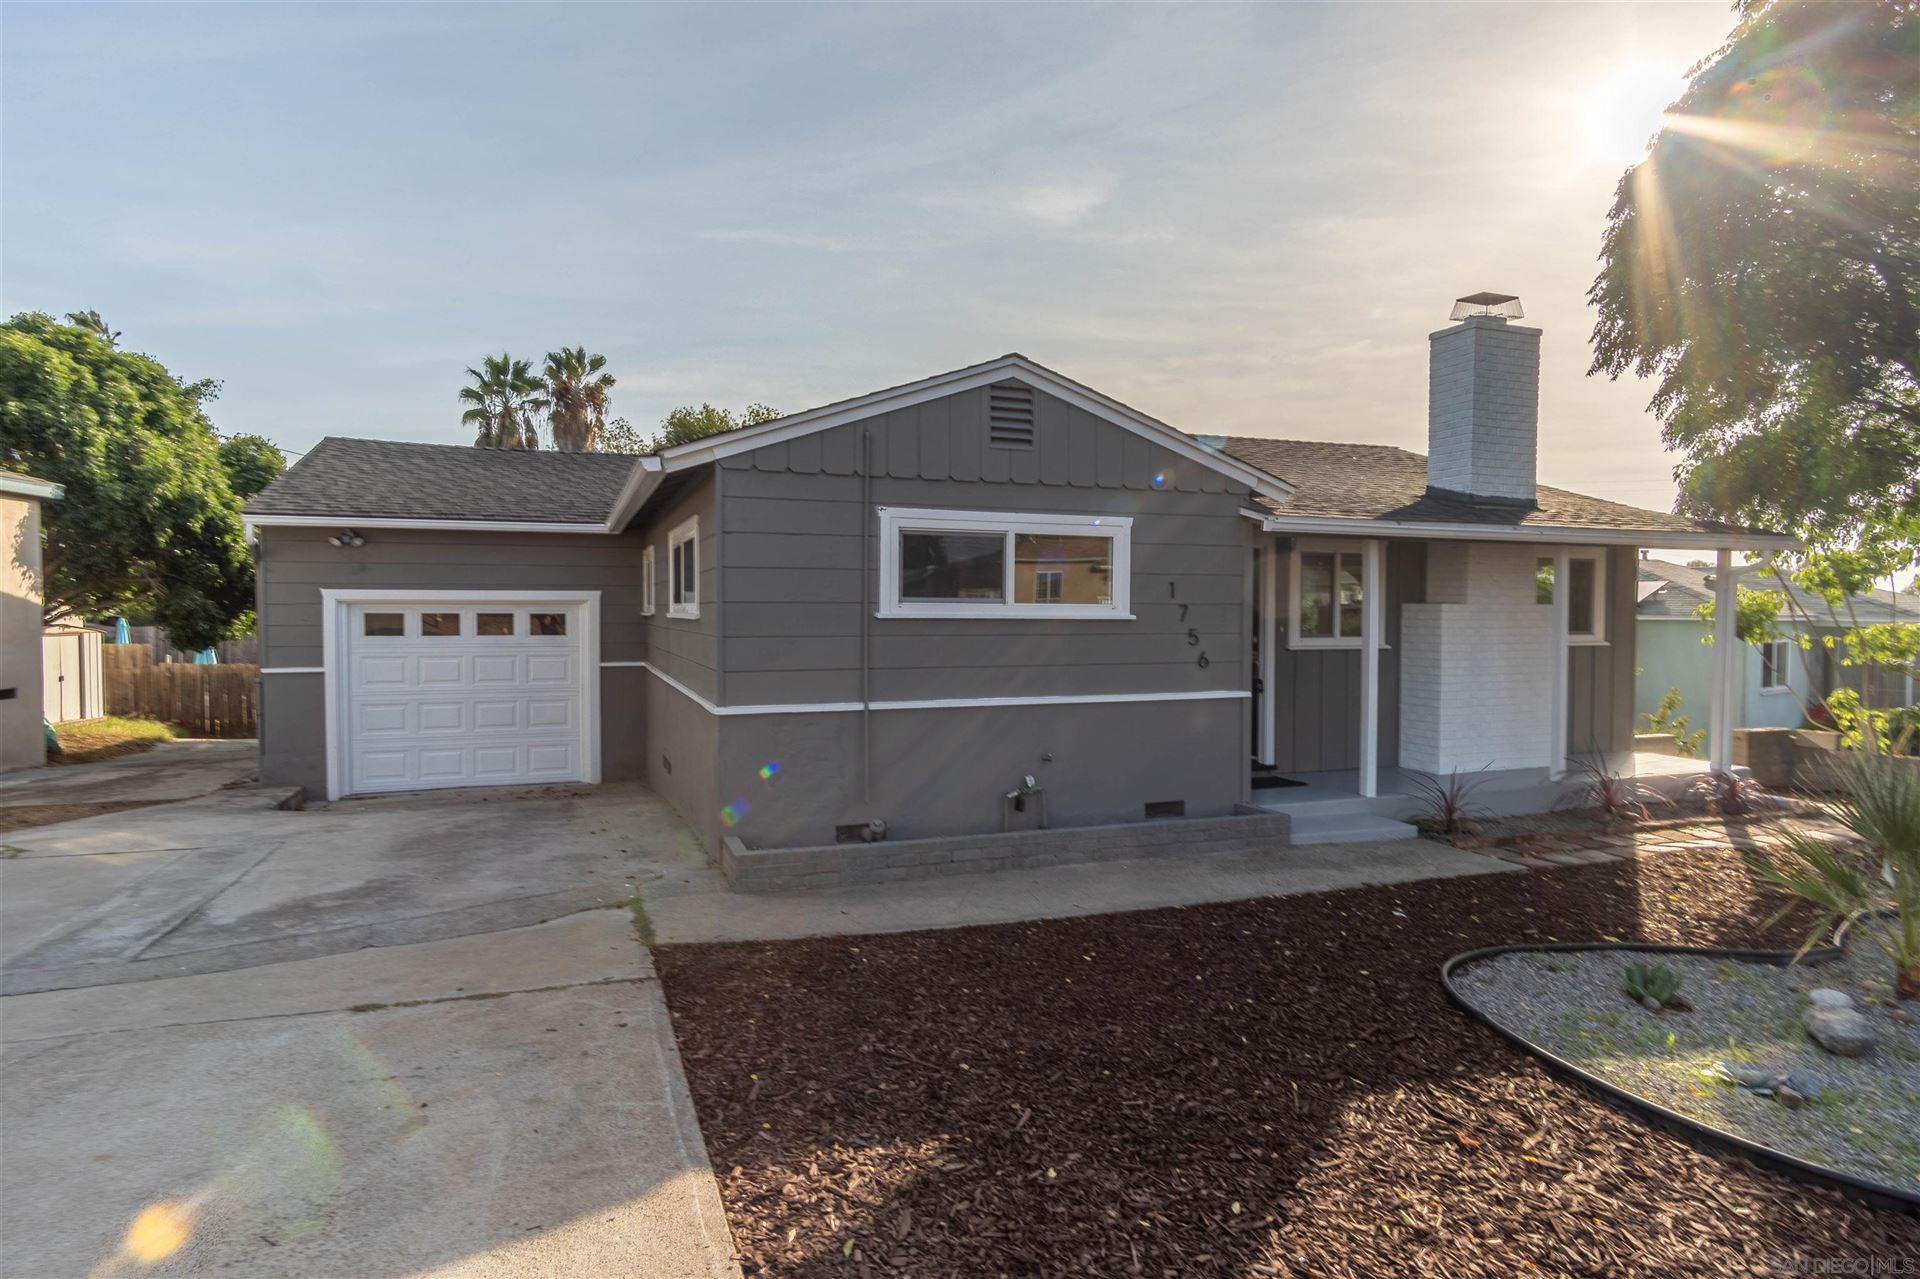 Photo of 1756 Elroy Dr, Lemon Grove, CA 91945 (MLS # 210027525)